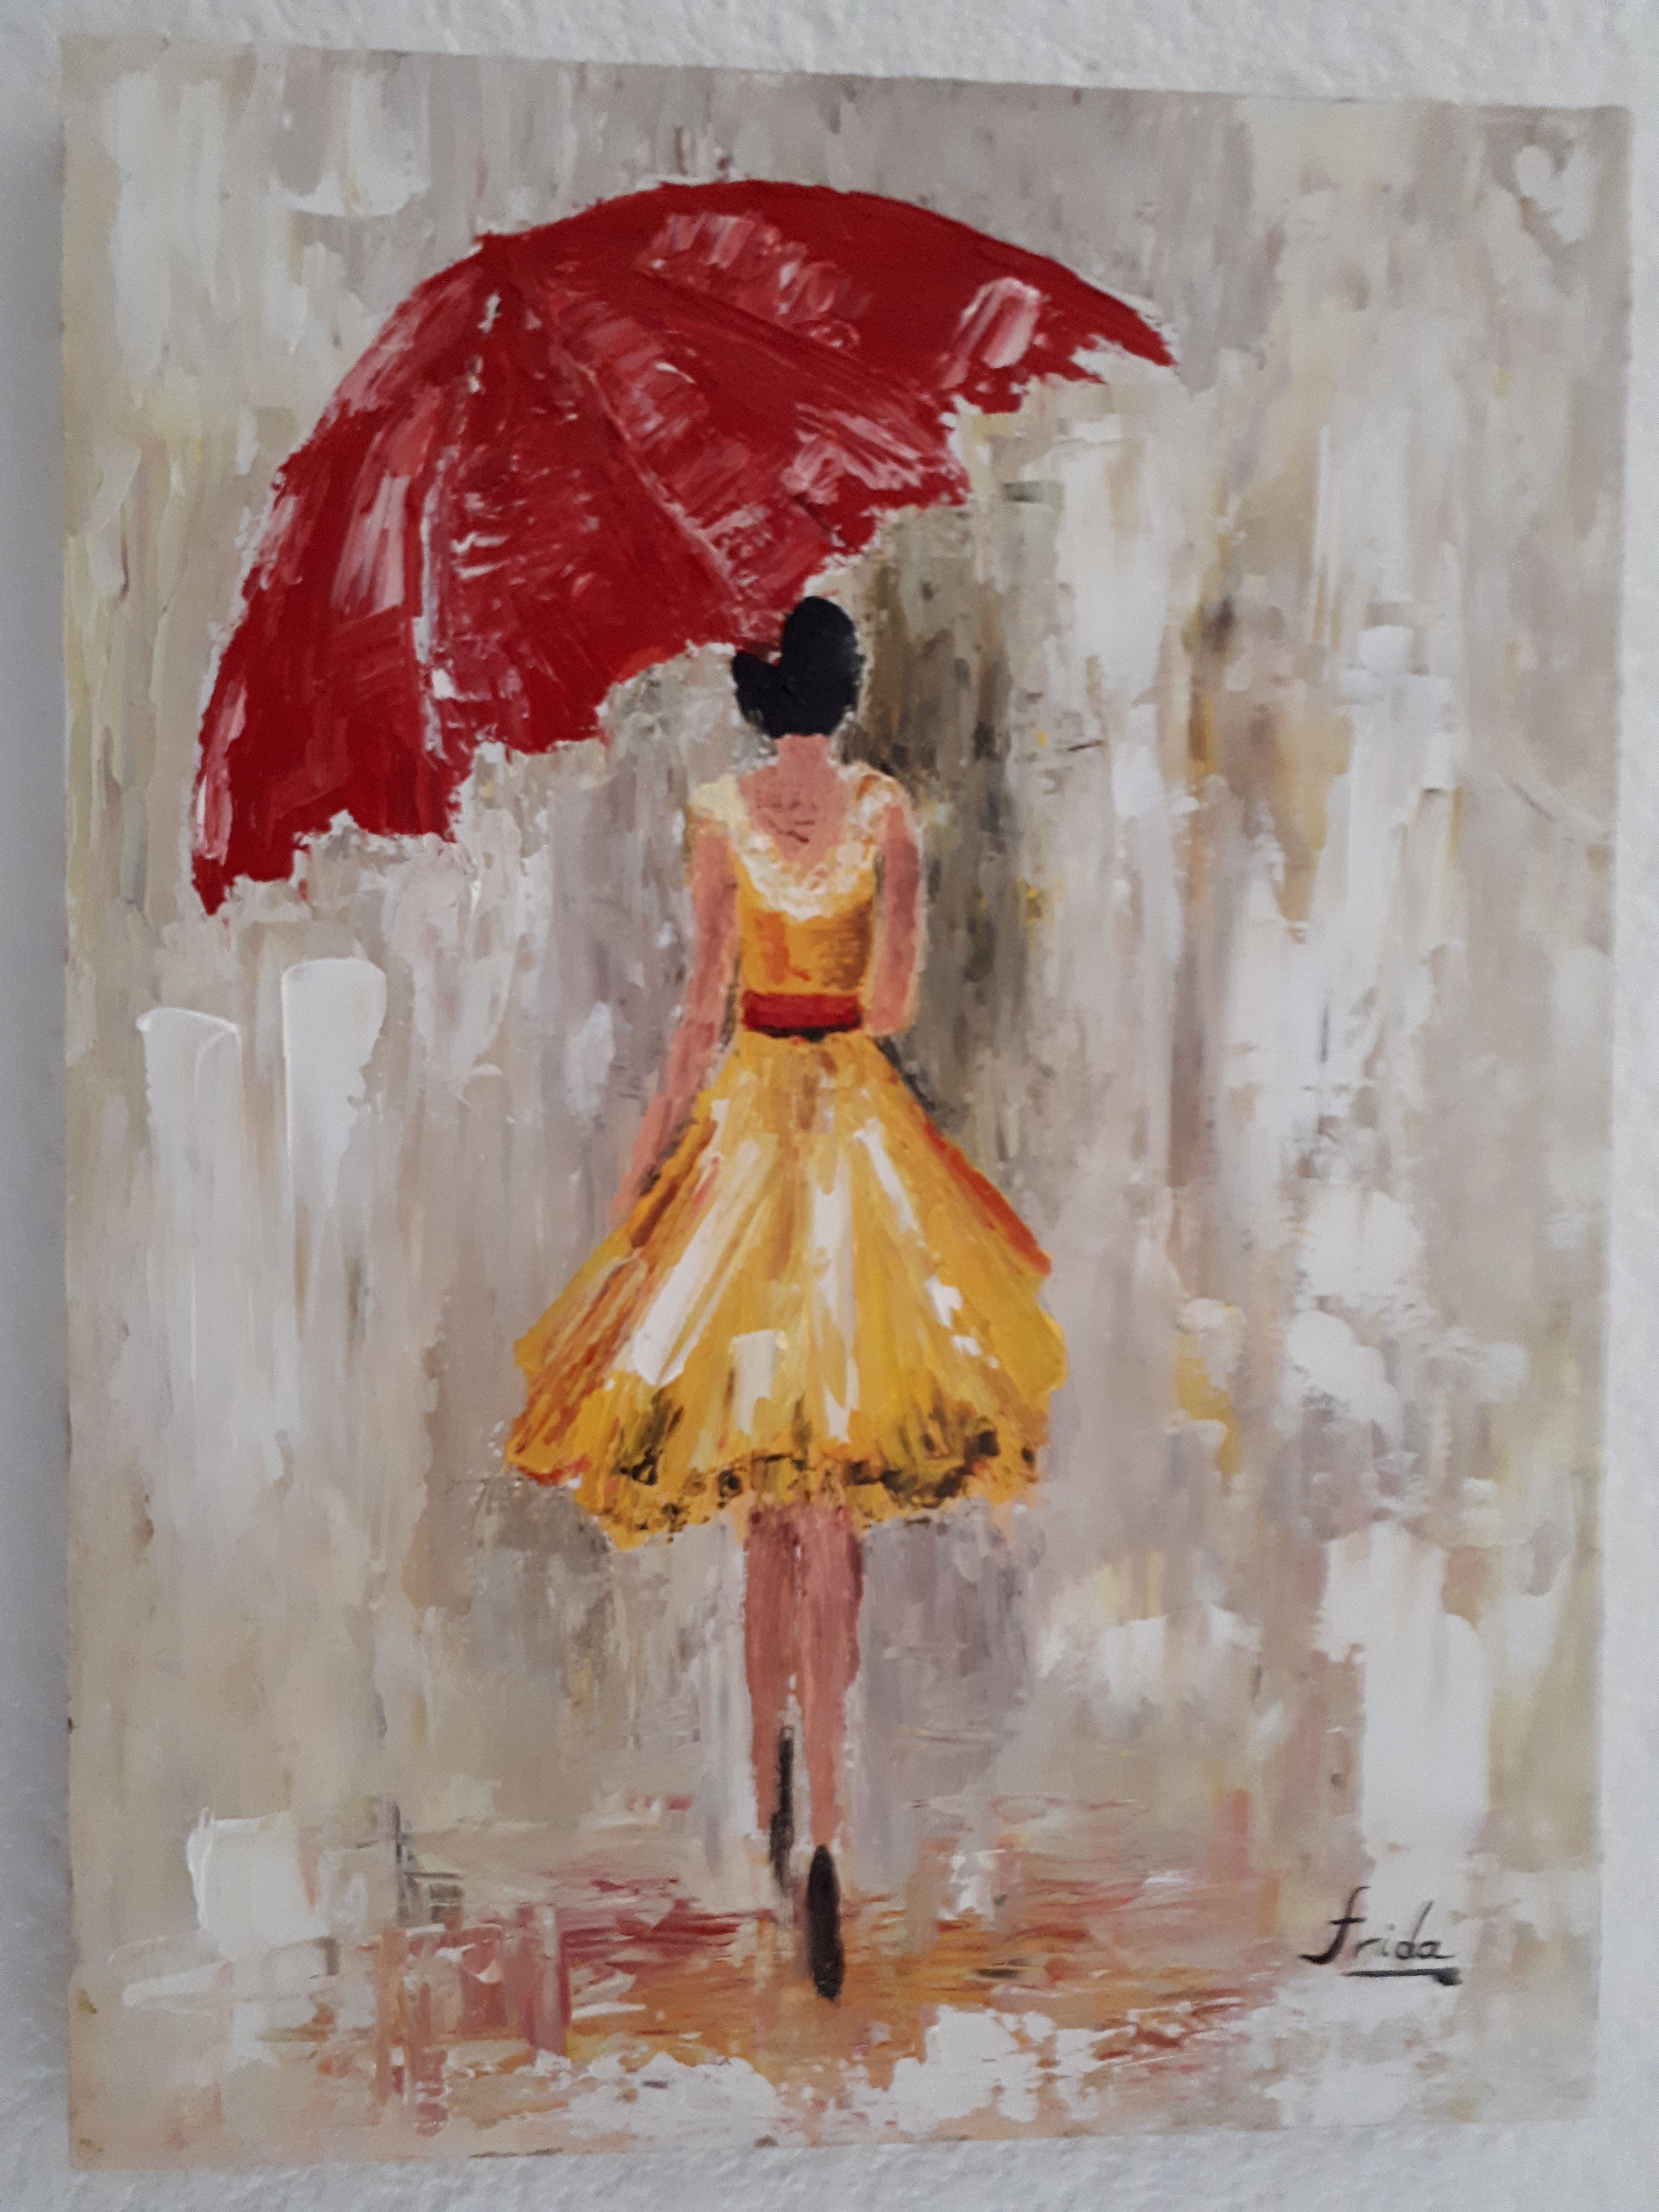 Mujer Bajo La Lluvia óleo Espatulado Paint Mujer Bajo La Lluvia Lluvia Dibujos Dibujo Mujer